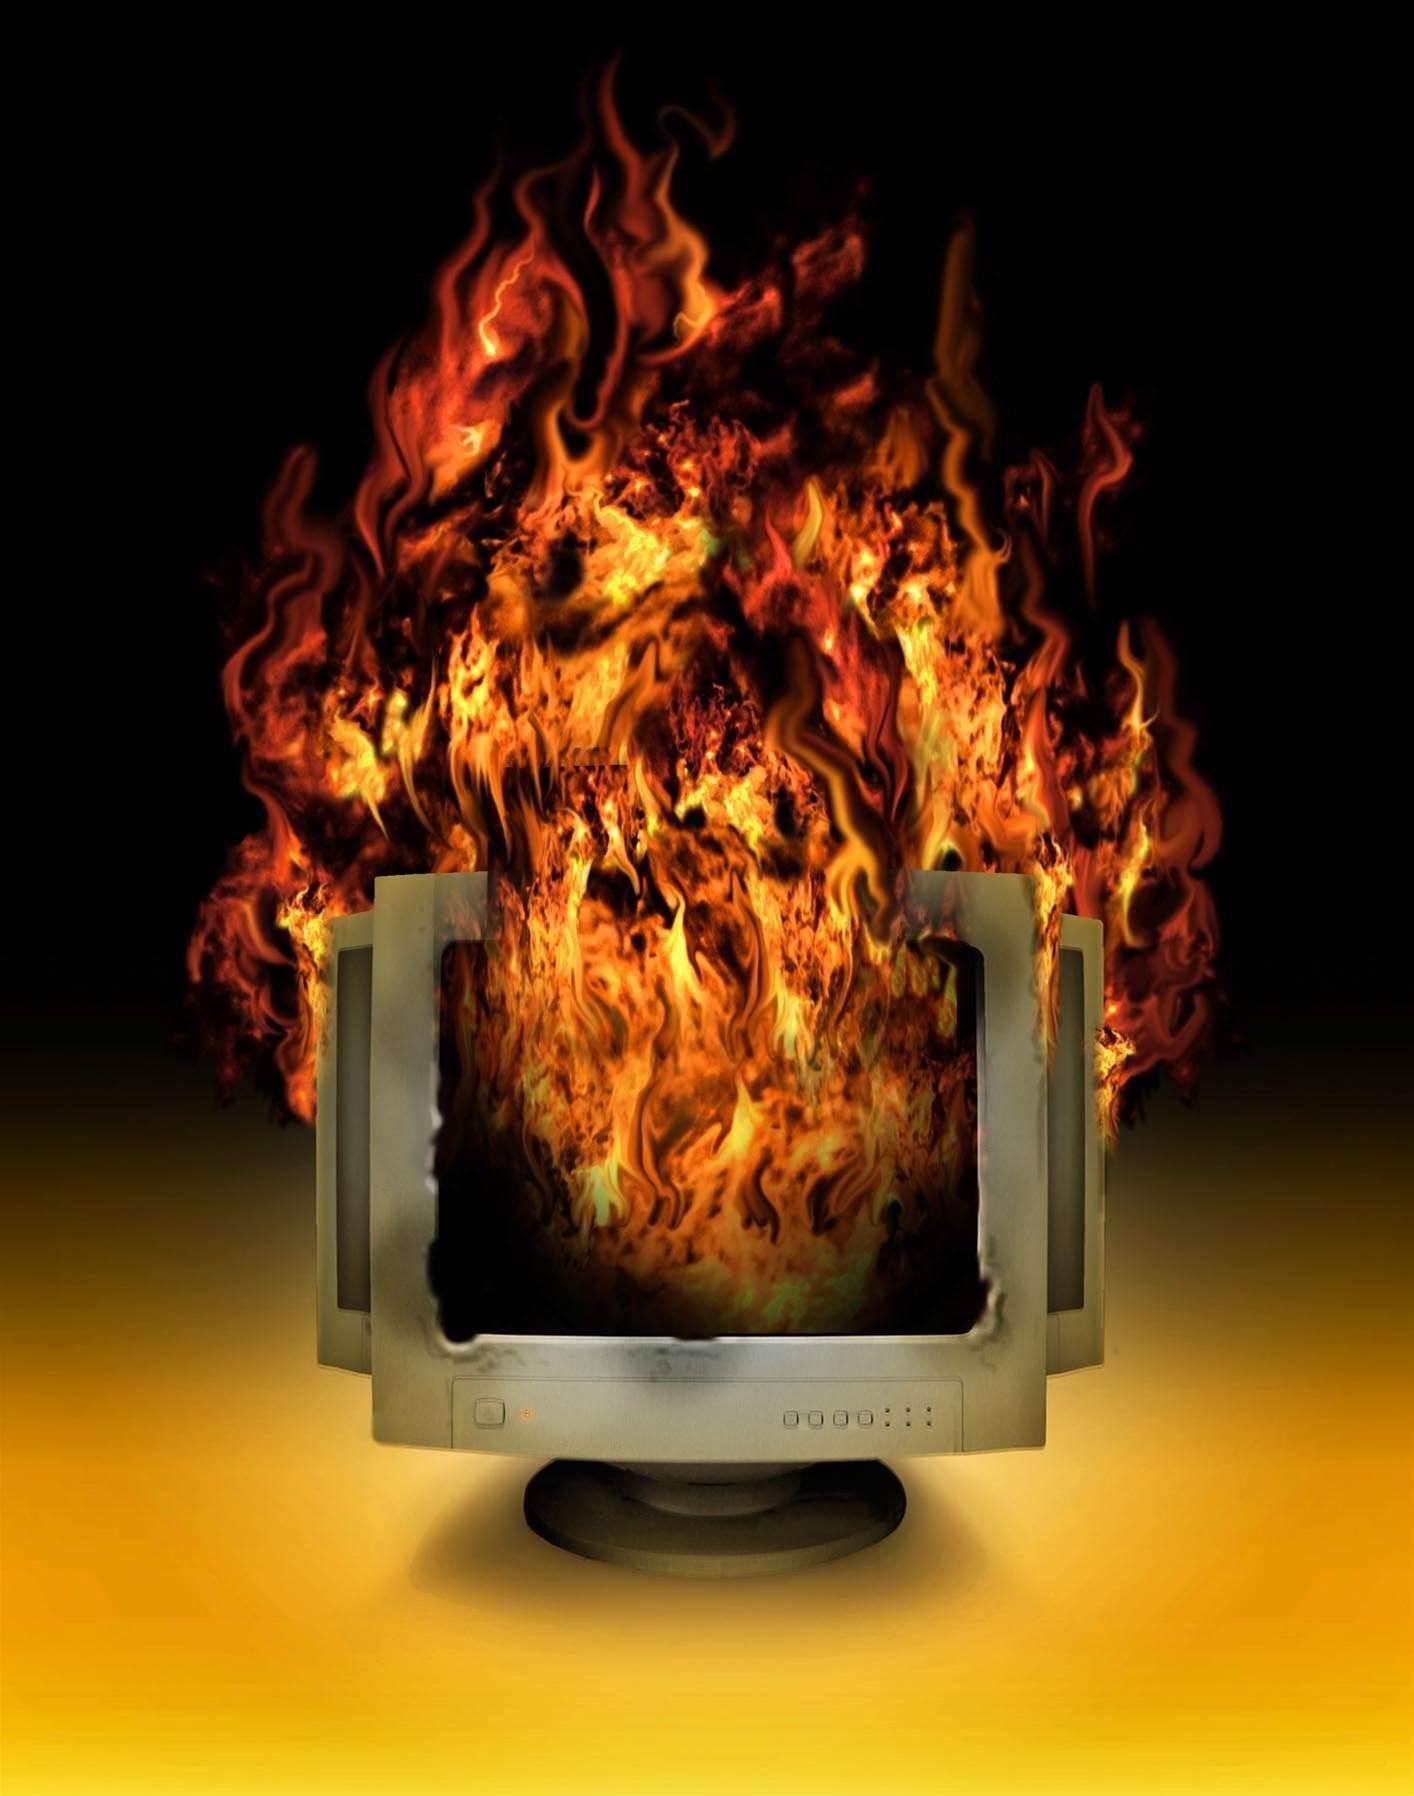 AWS outage takes out high-profile sites